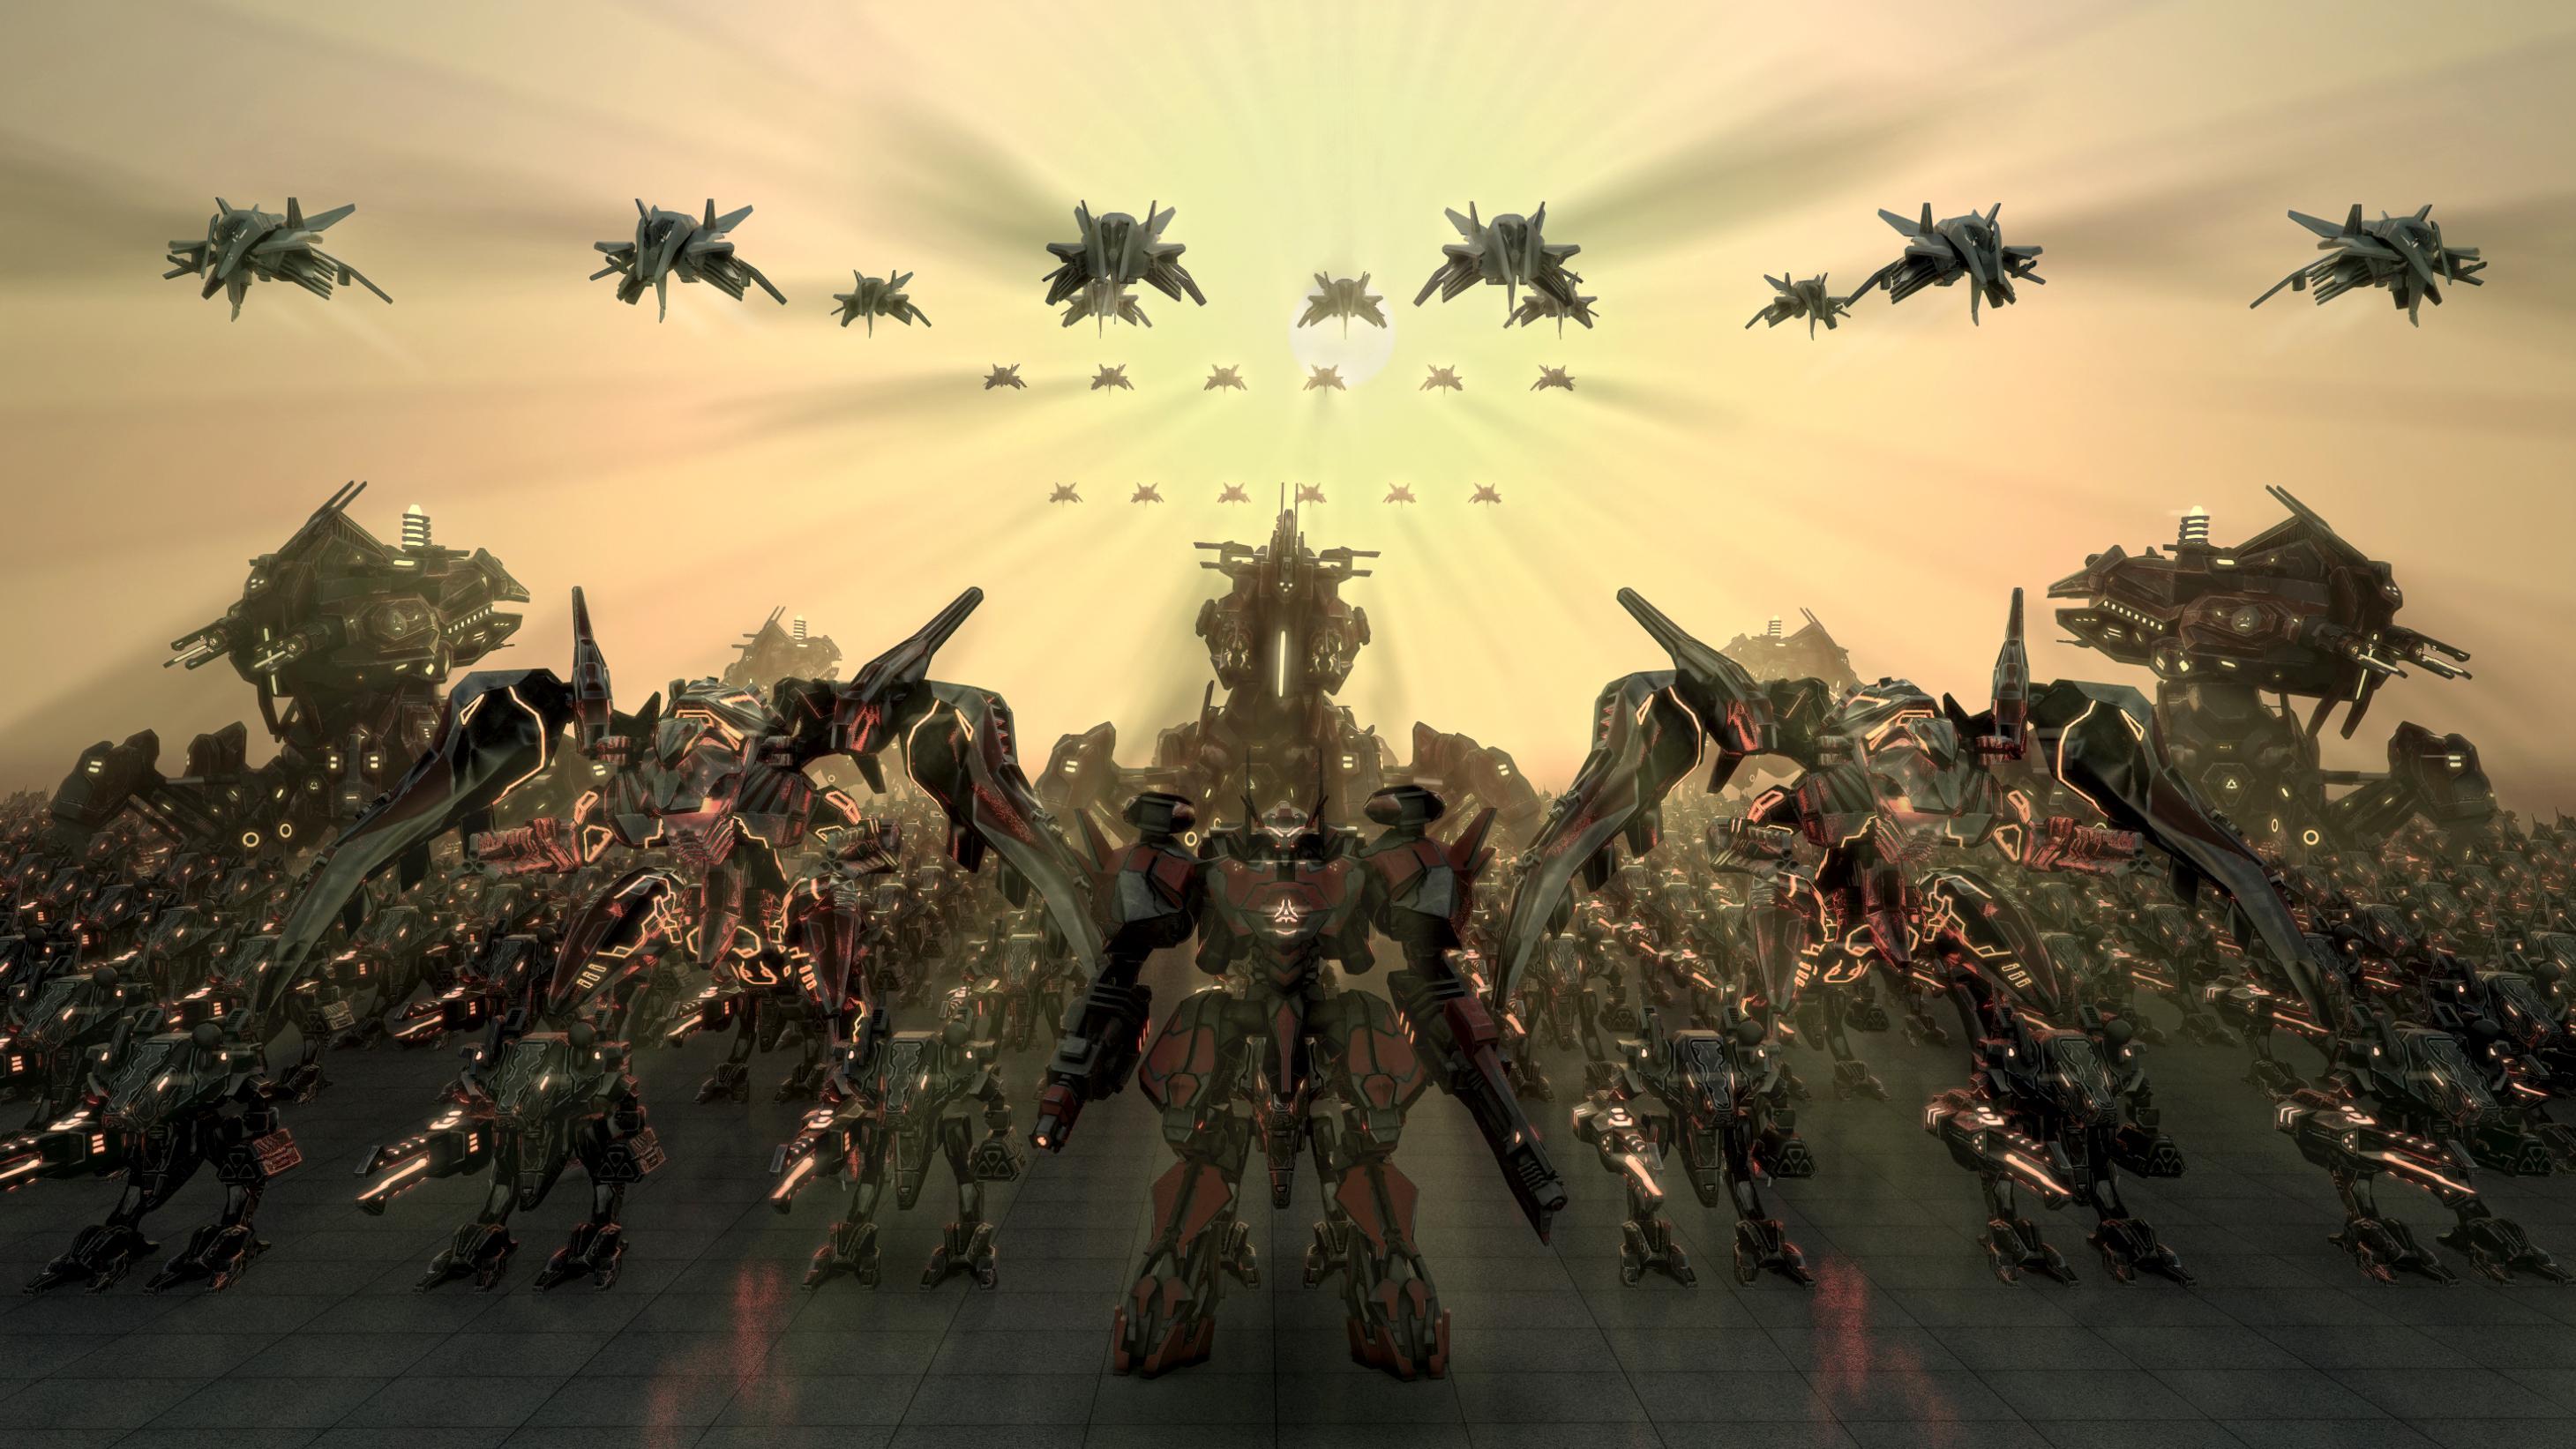 Cybran Wallpaper 1 by Avitus12